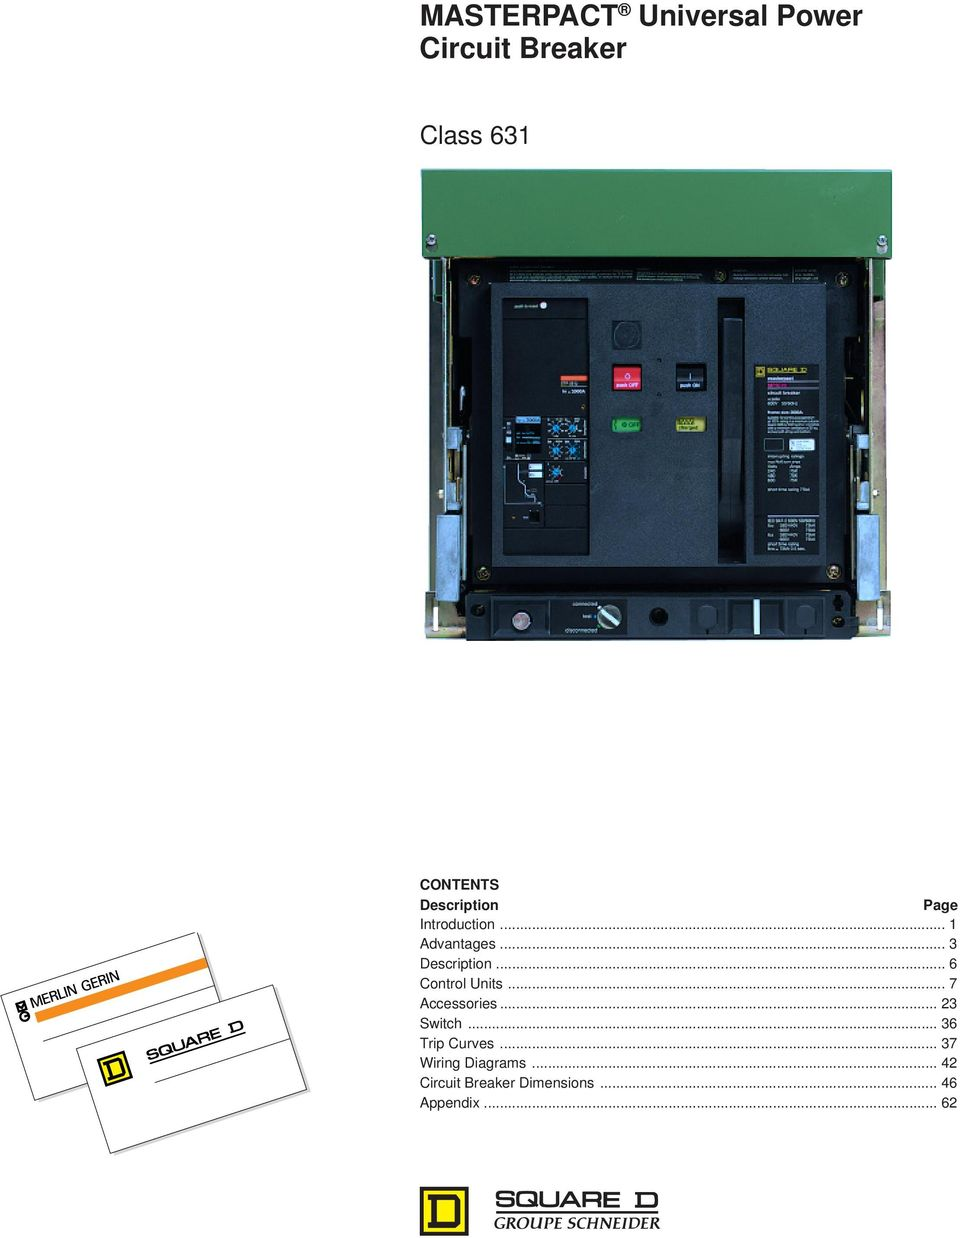 Wiring diagram acb schneider free download wiring diagram xwiaw free download wiring diagram masterpact universal power circuit breaker pdf of wiring diagram acb schneider cheapraybanclubmaster Images